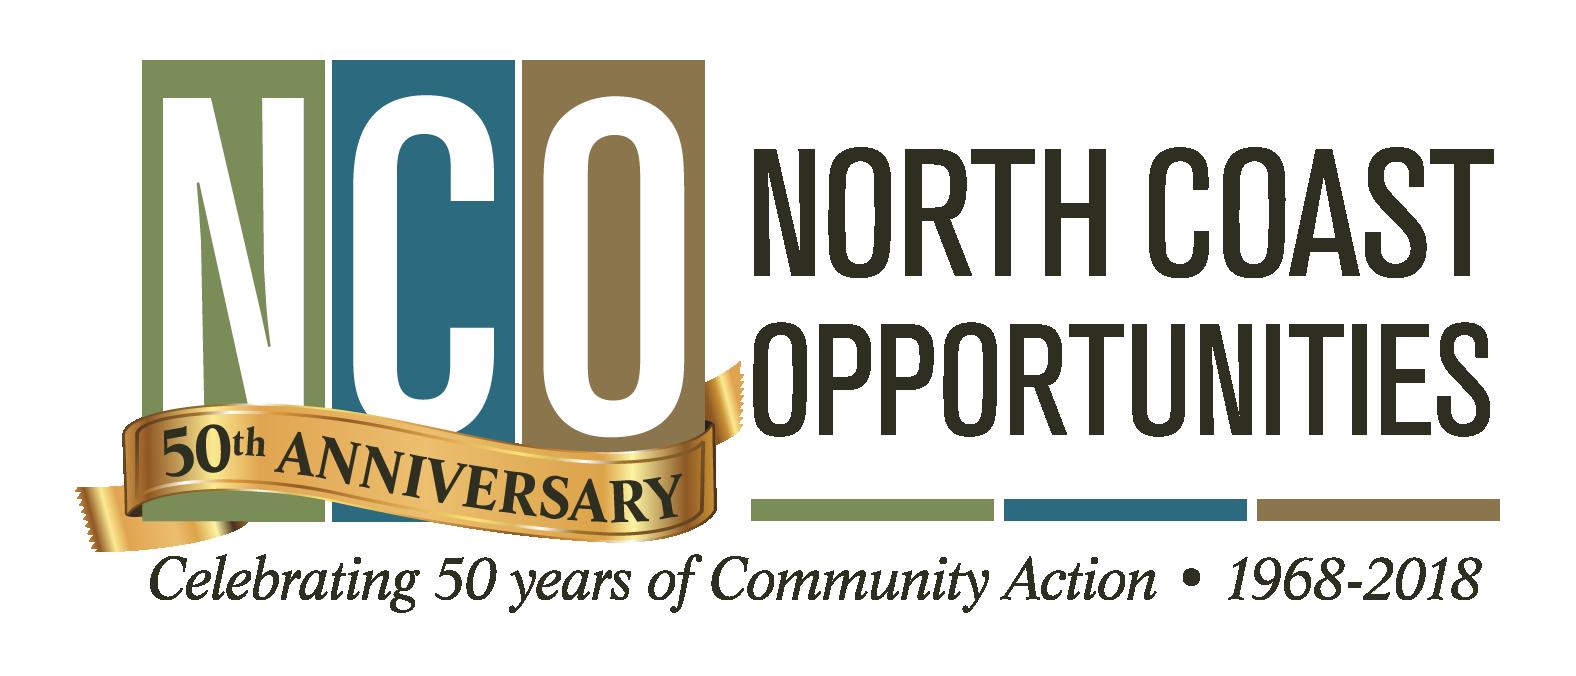 Mendocino College Campus Map.Caring Kitchen Project Programs Nco Inc 2019 Ukiah California